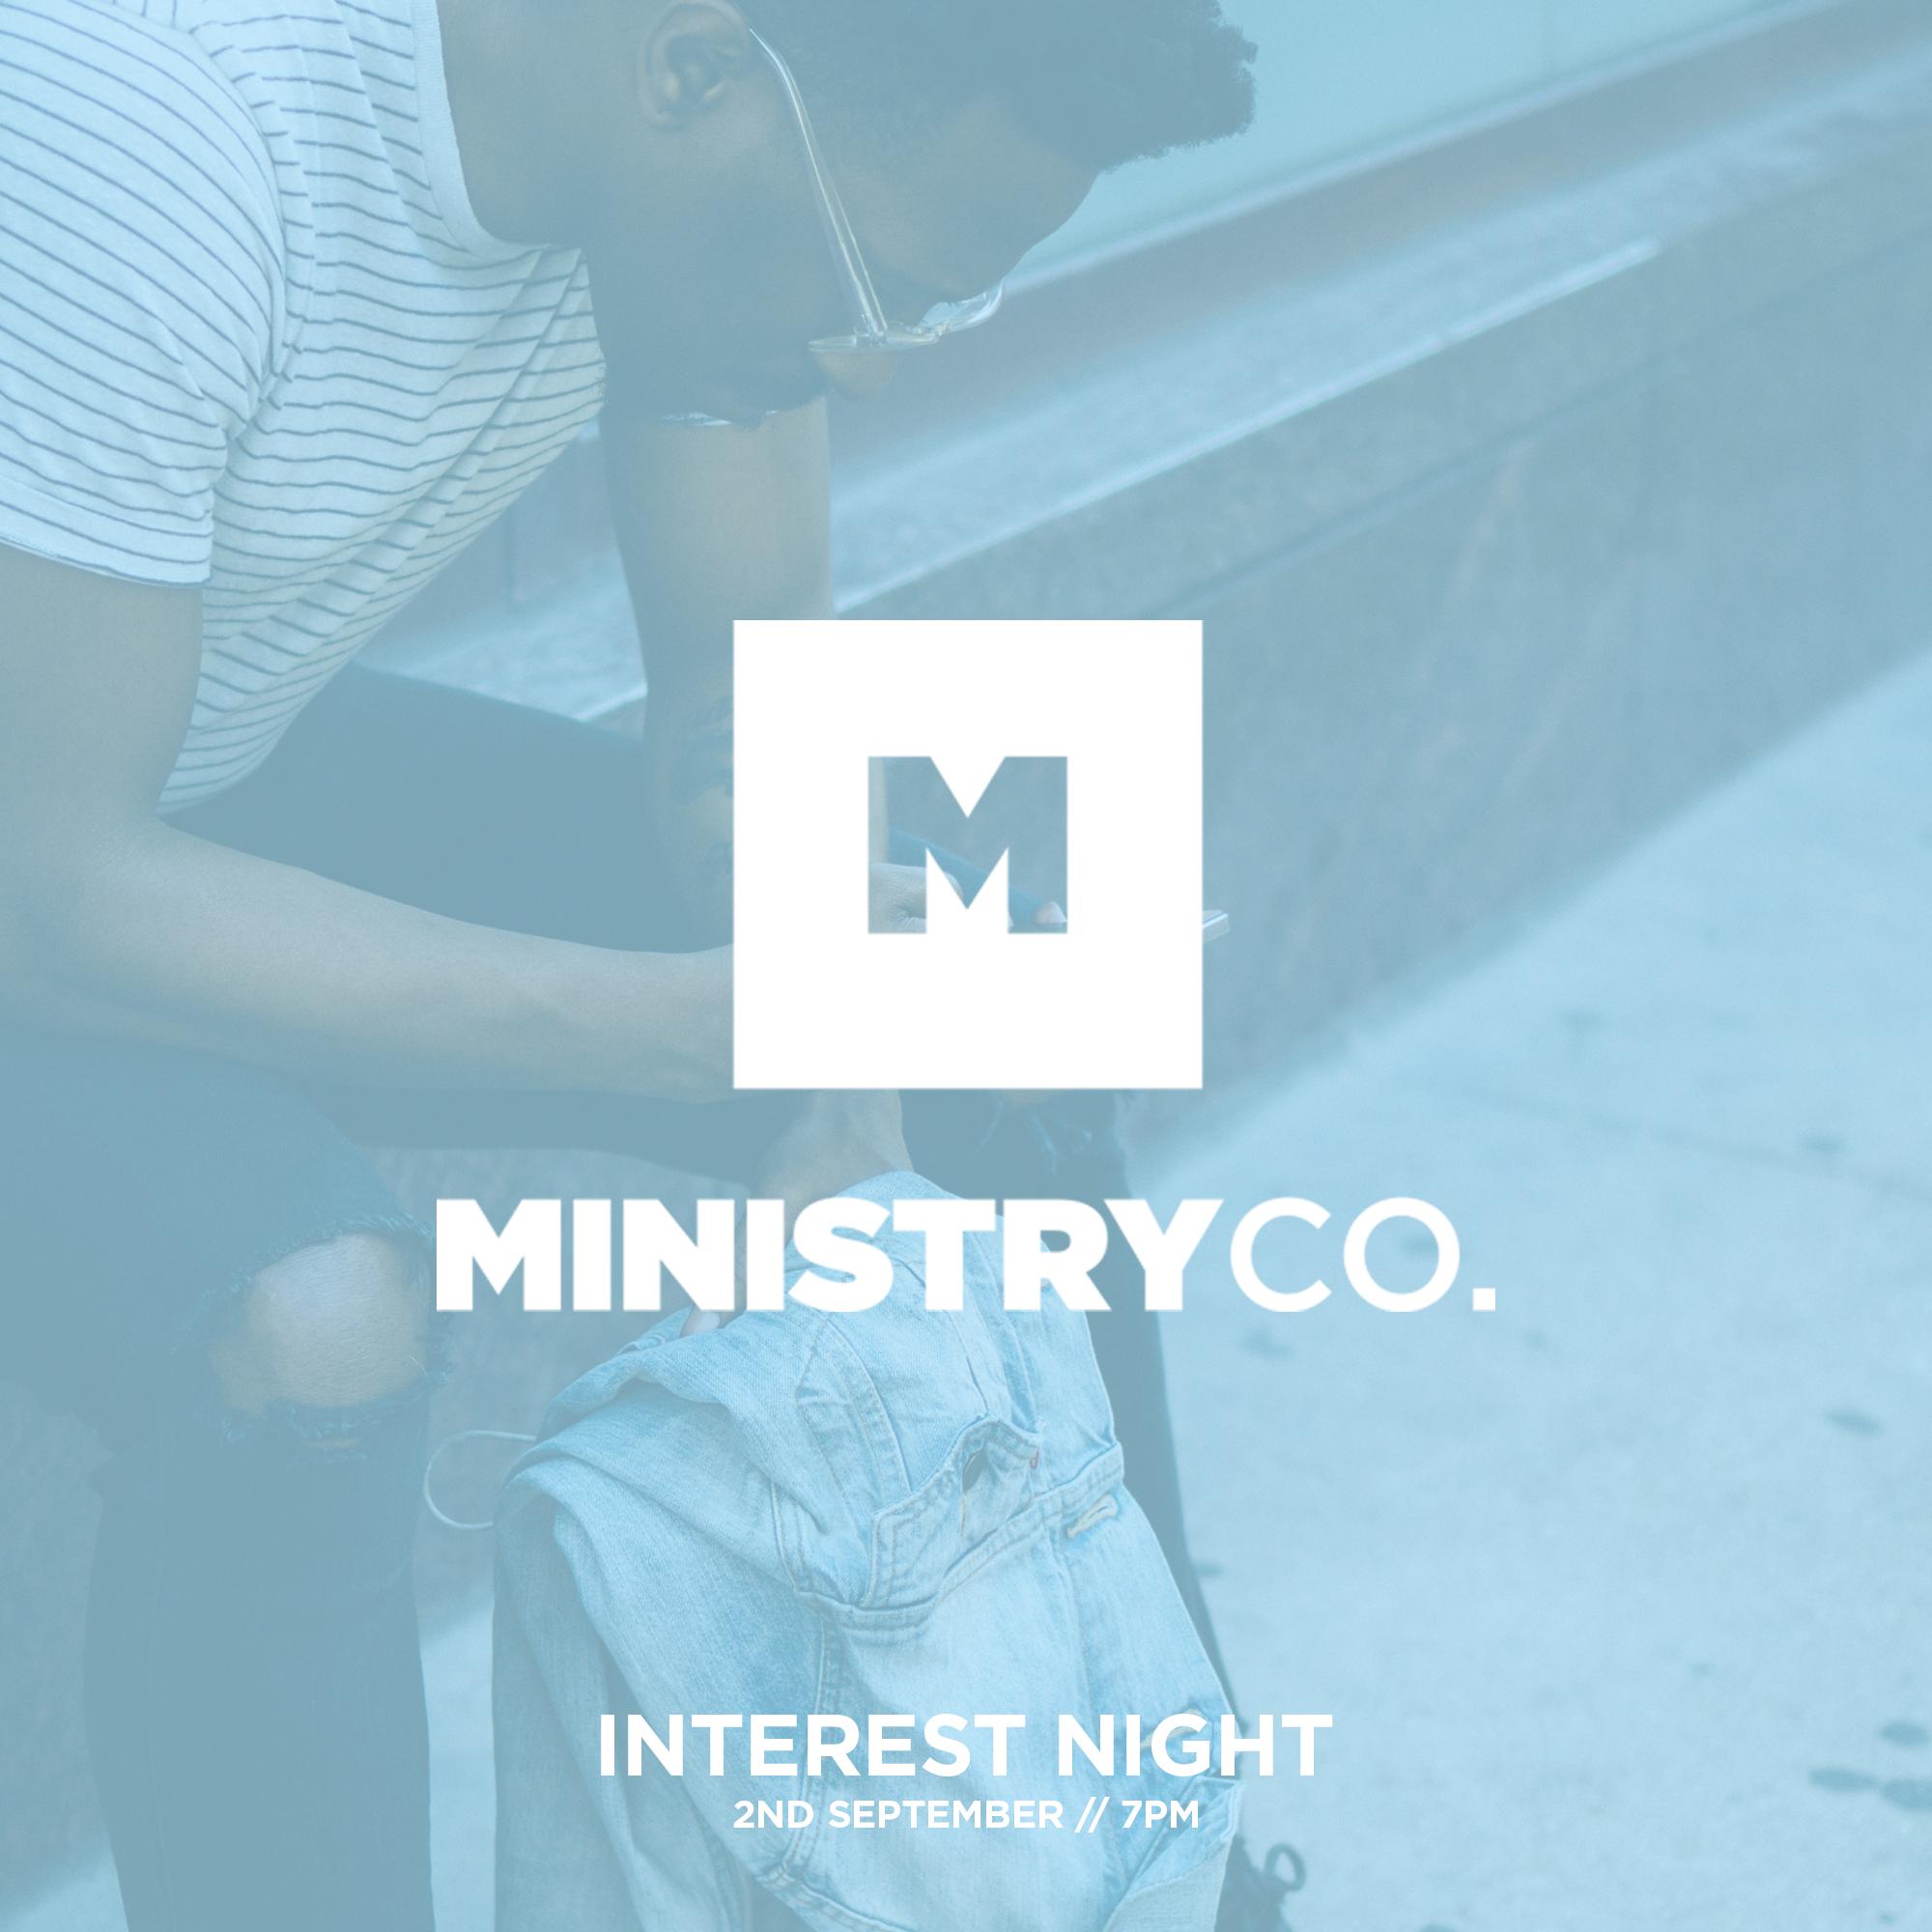 MinistryCo_InterestNight_2ndSept_POST.jpg